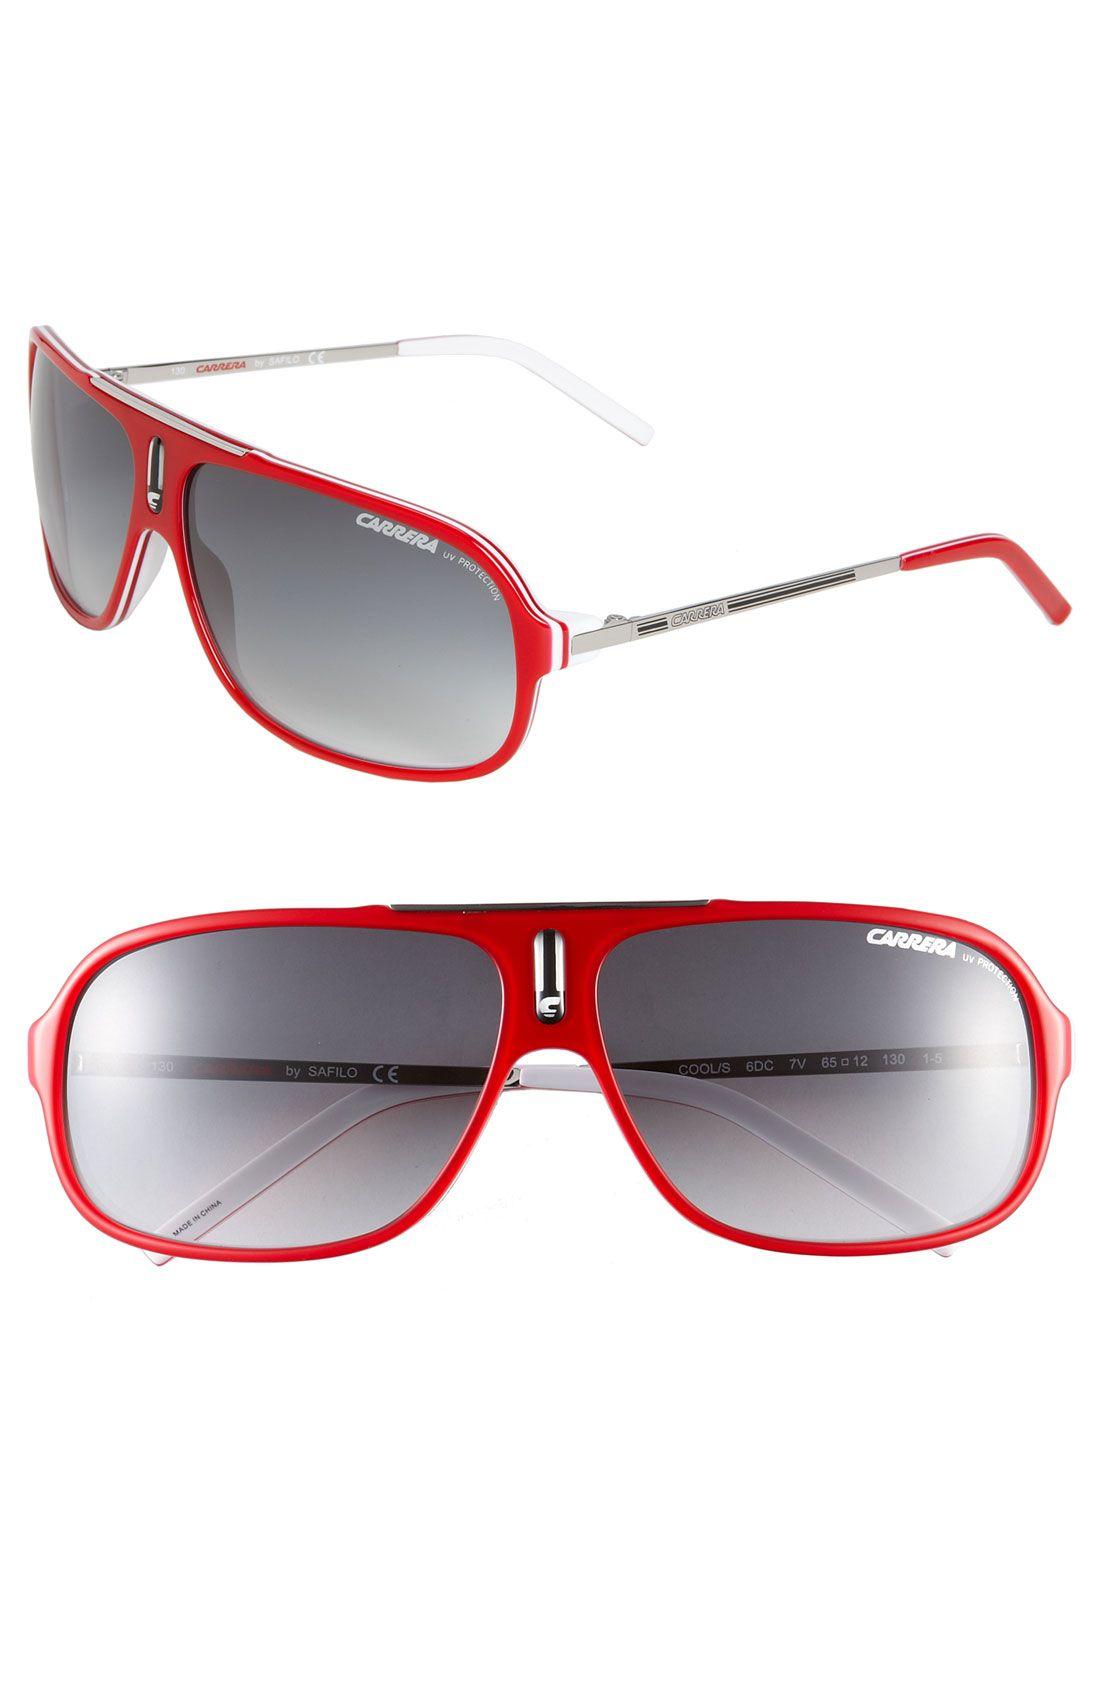 6b5733f6cb765 Carrera Hot 64mm Polarized Vintage Inspired Aviator Sunglasses in Red for  Men (Red White)